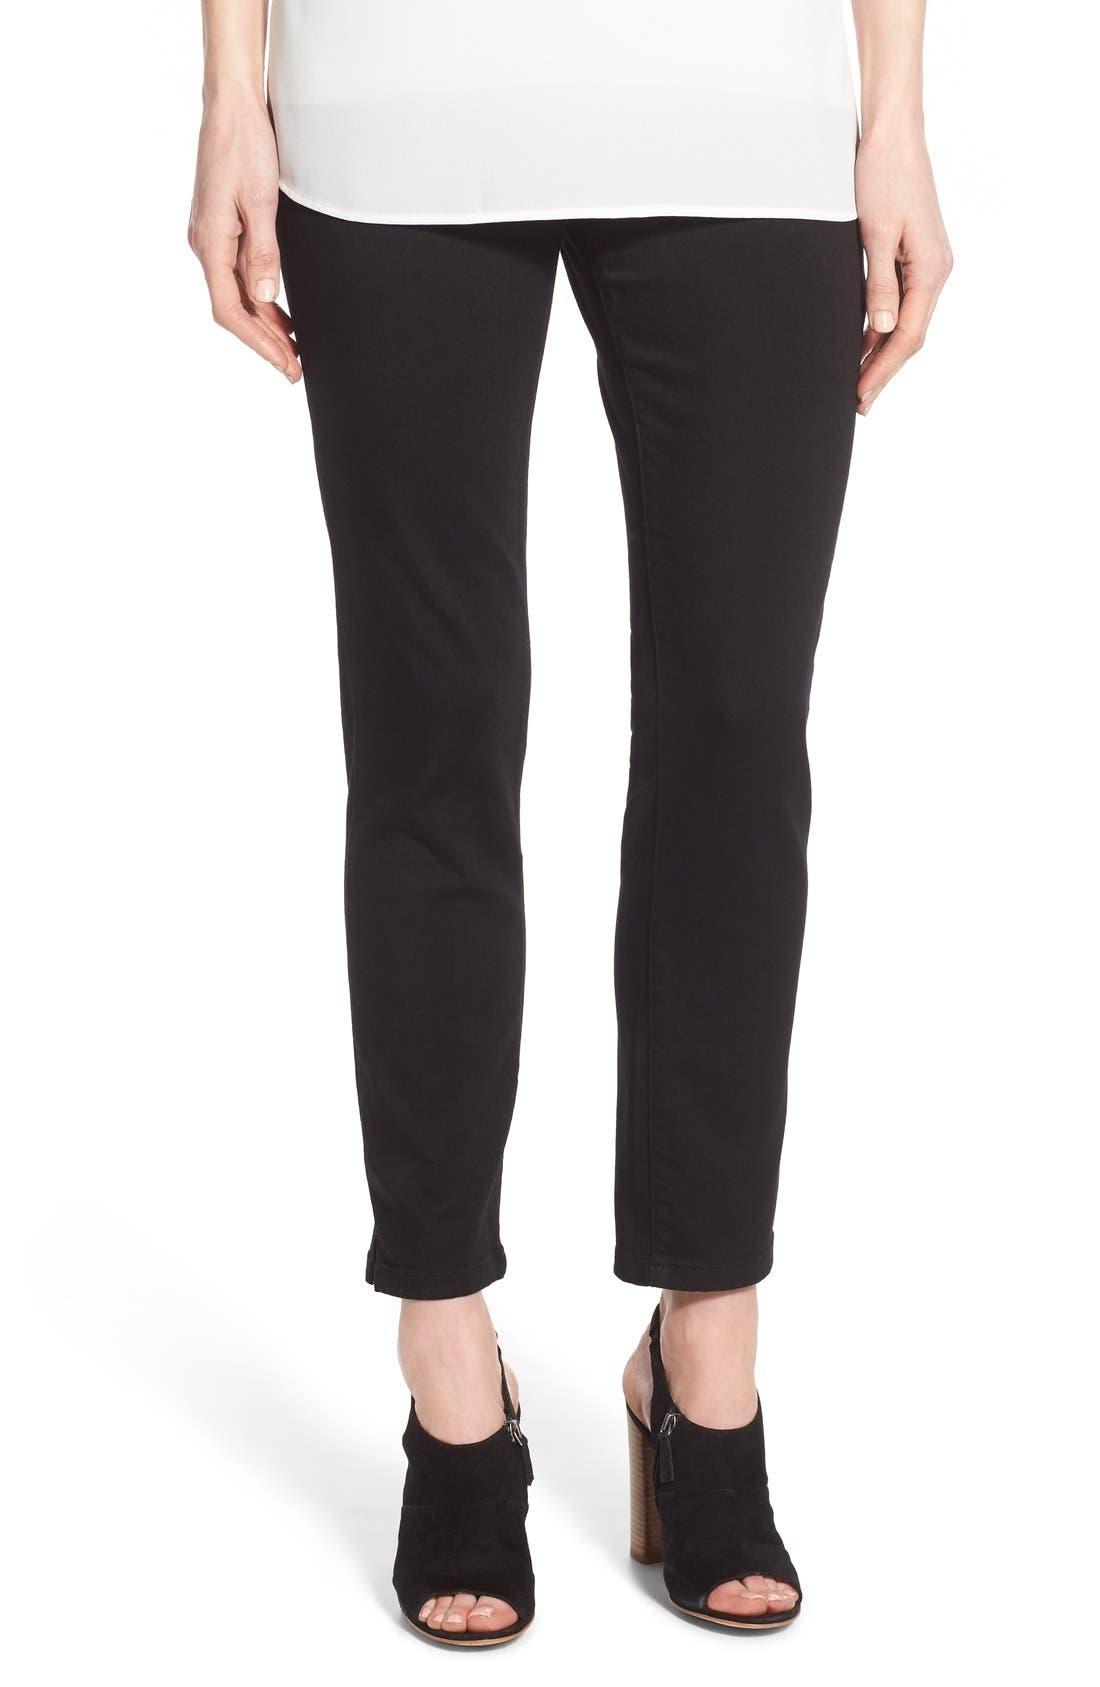 Alternate Image 1 Selected - NYDJ Millie Pull-On Stretch Ankle Skinny Jeans (Regular & Petite)